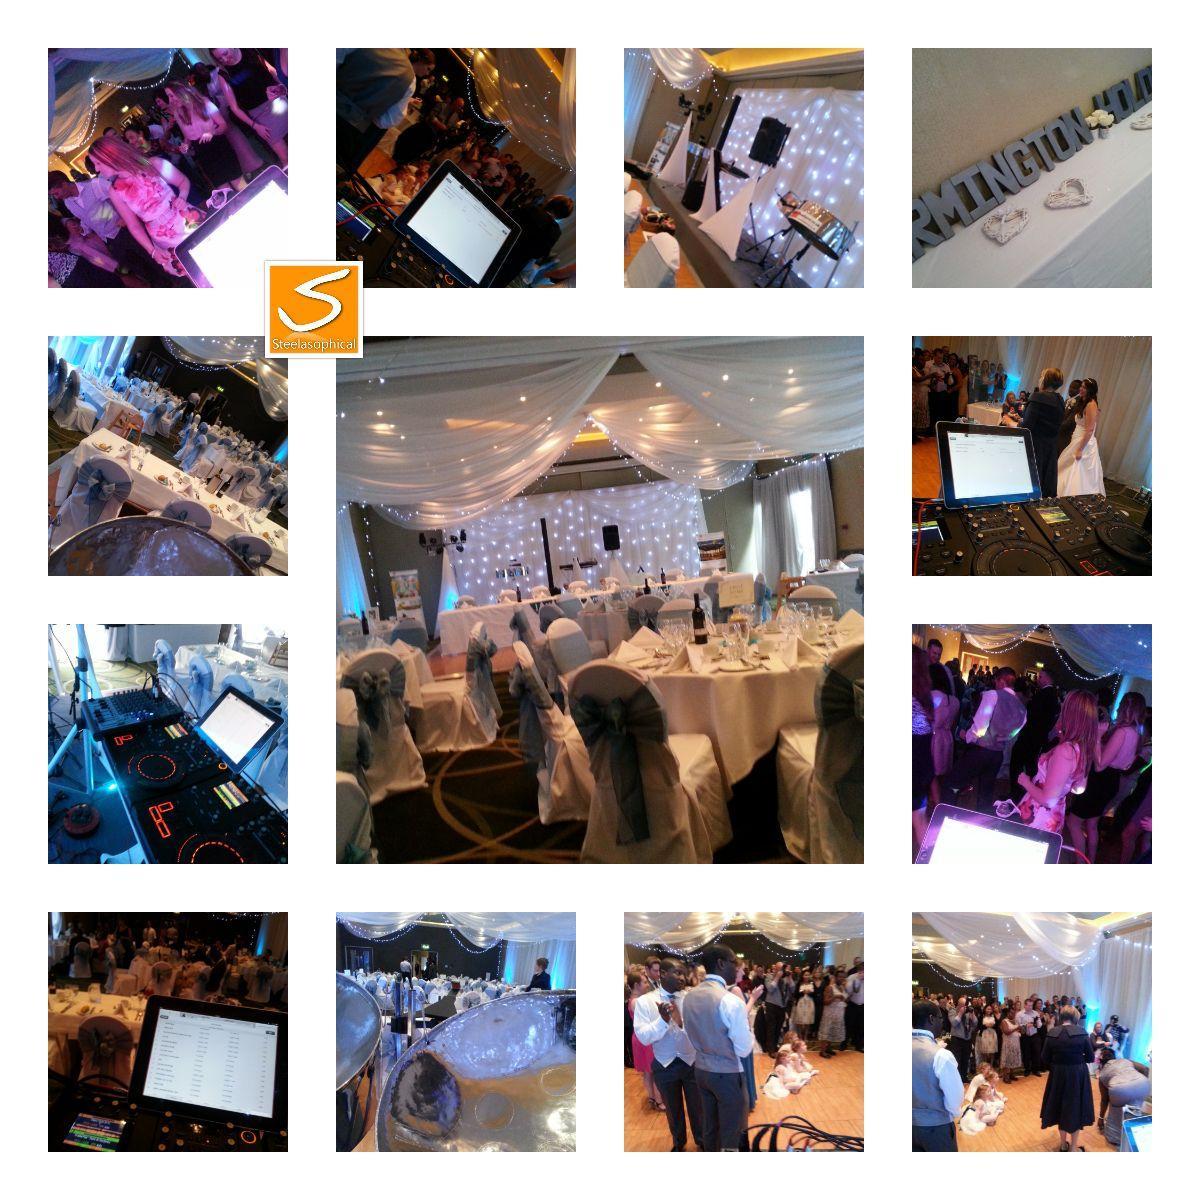 Gerrards Cross wedding venue steelasophical steel band